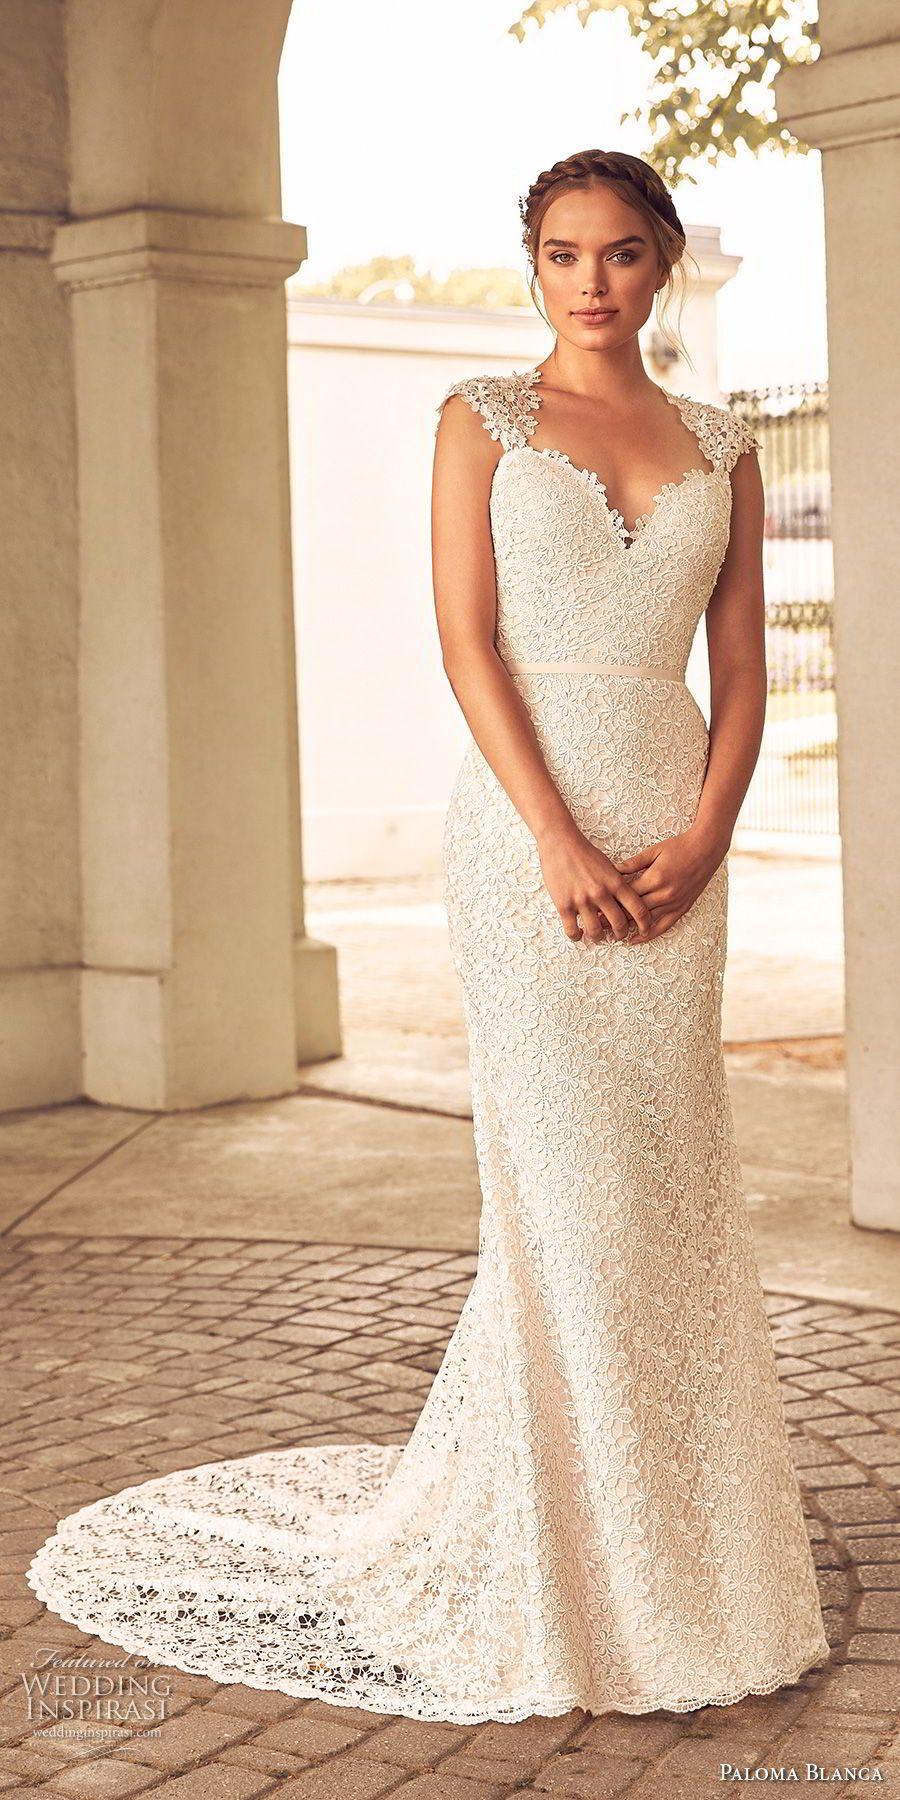 Paloma Blanca Spring 2018 Wedding Dresses Wedding Inspirasi Wedding Dress Cap Sleeves Fit And Flare Wedding Dress Wedding Dress Belt [ 1800 x 900 Pixel ]